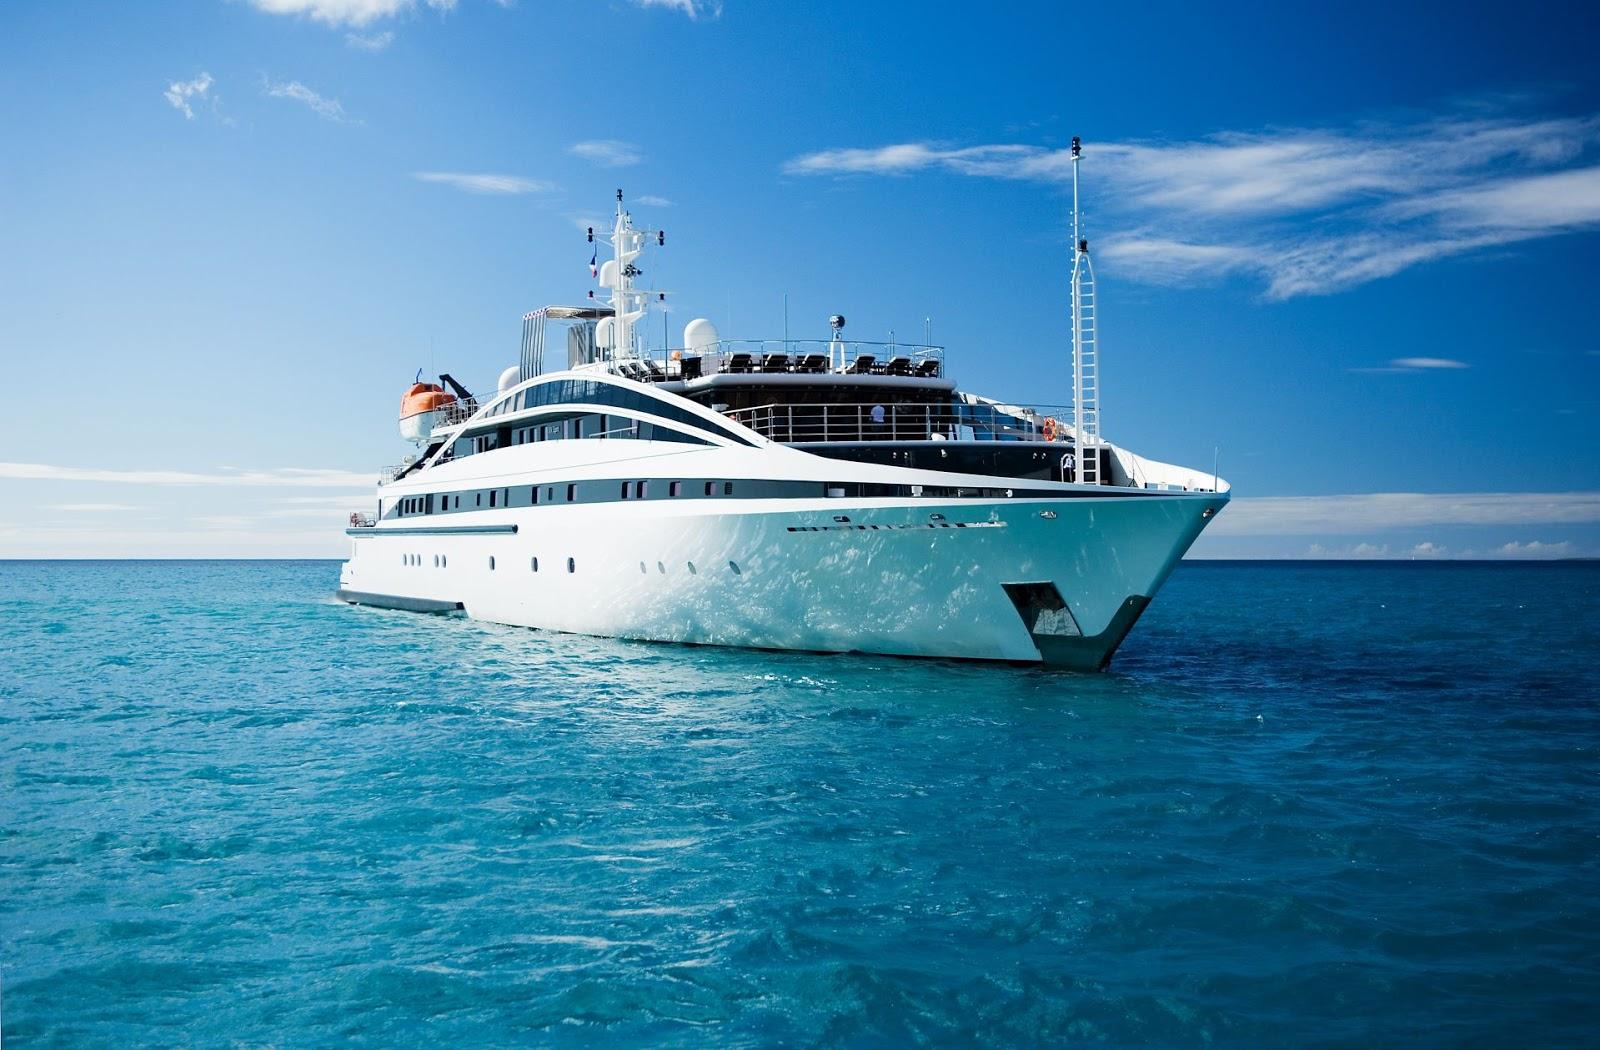 Alquiler de barcos en ibiza y Mallorca